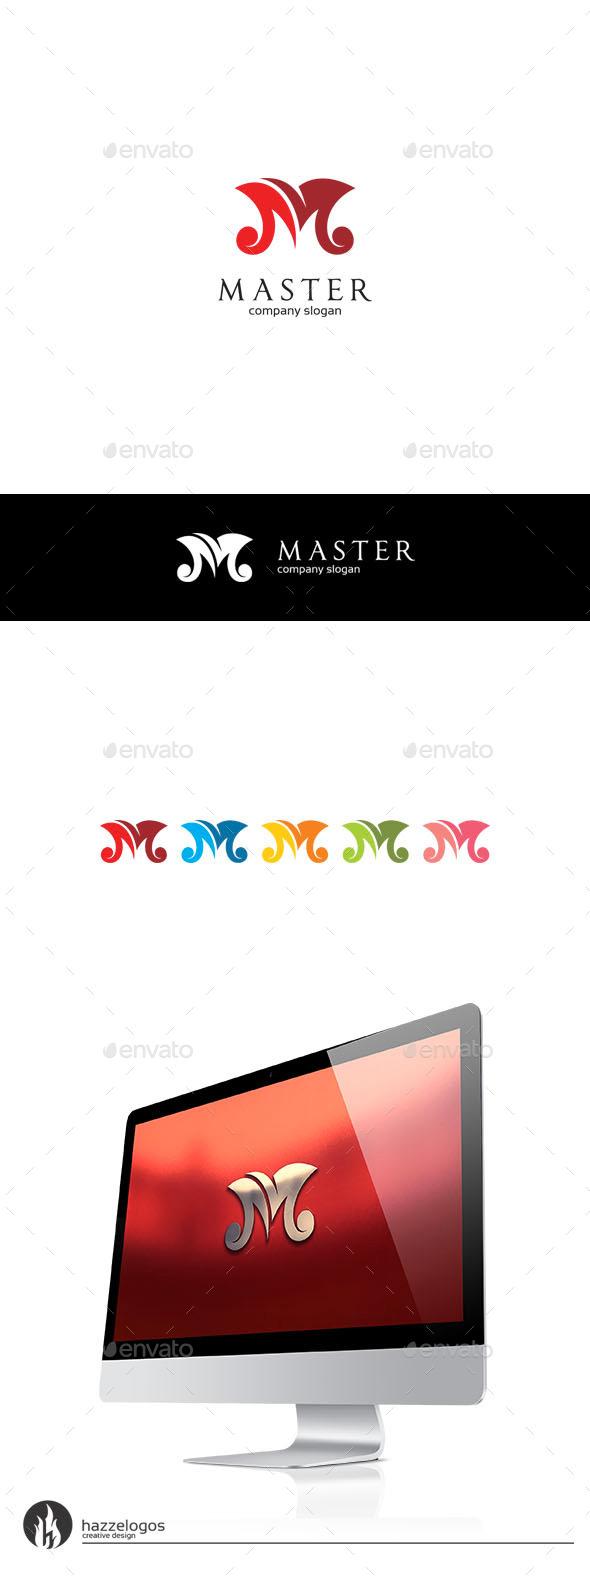 GraphicRiver Master Logo 9876698